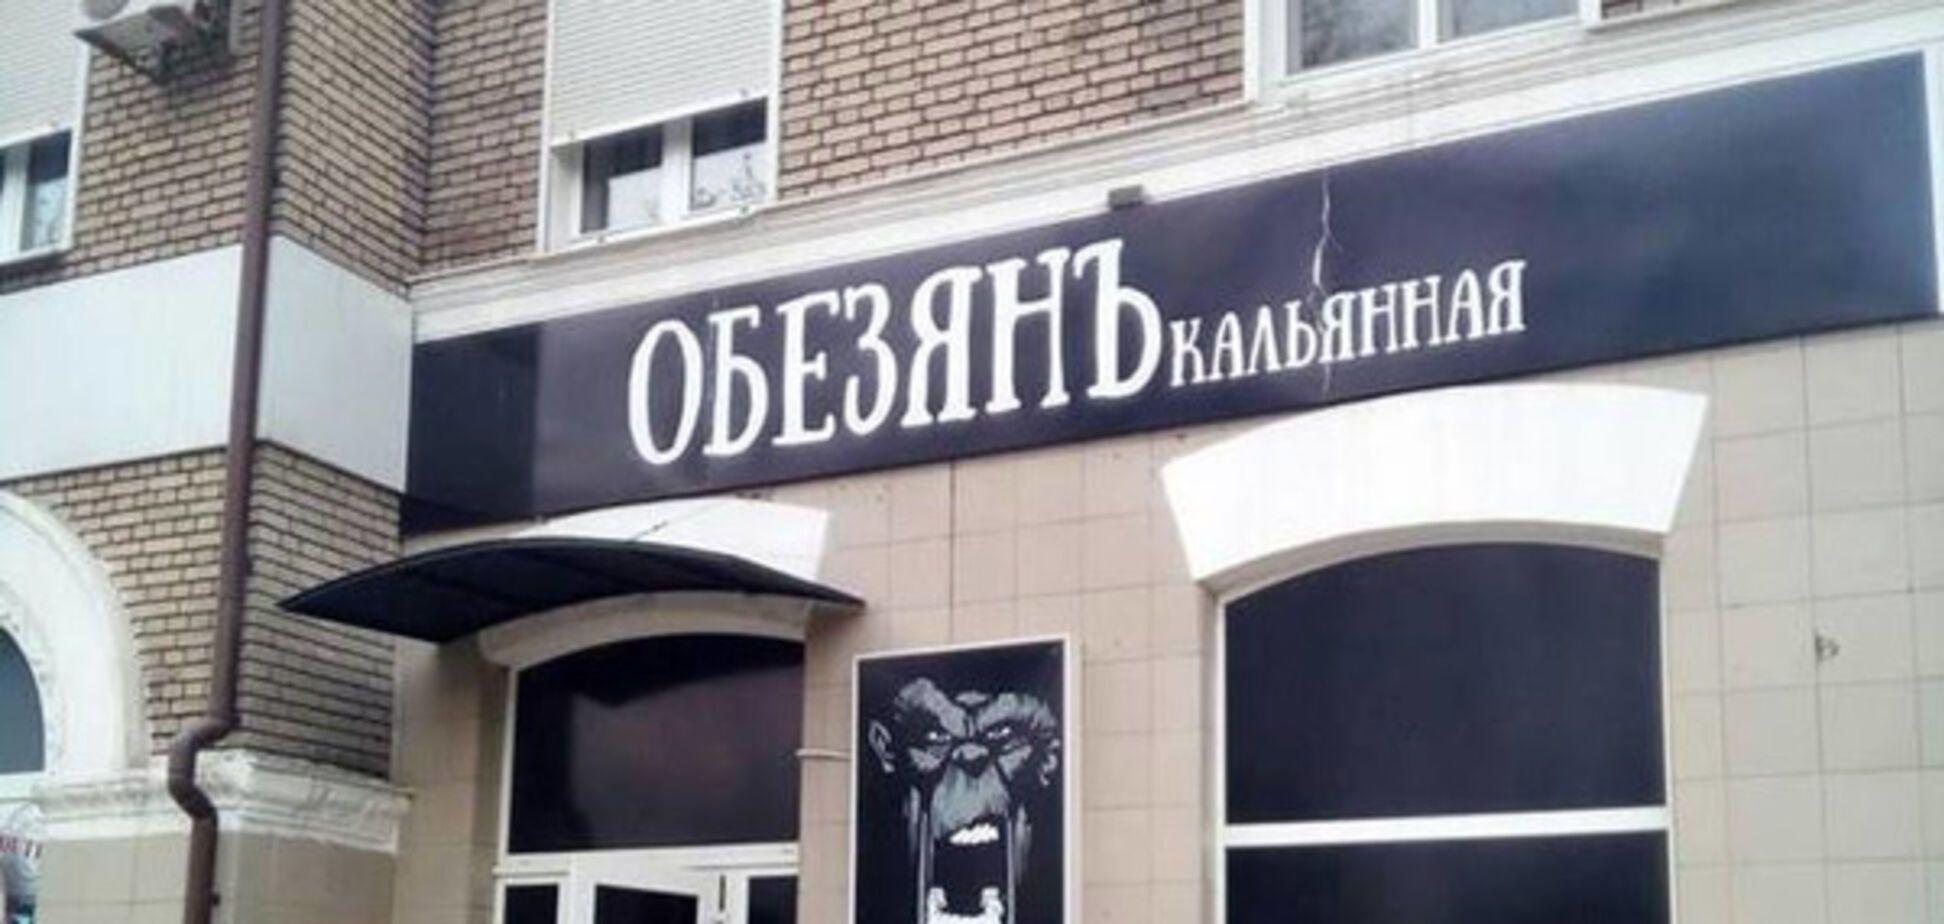 \'Обезянъ\' у Донецьку